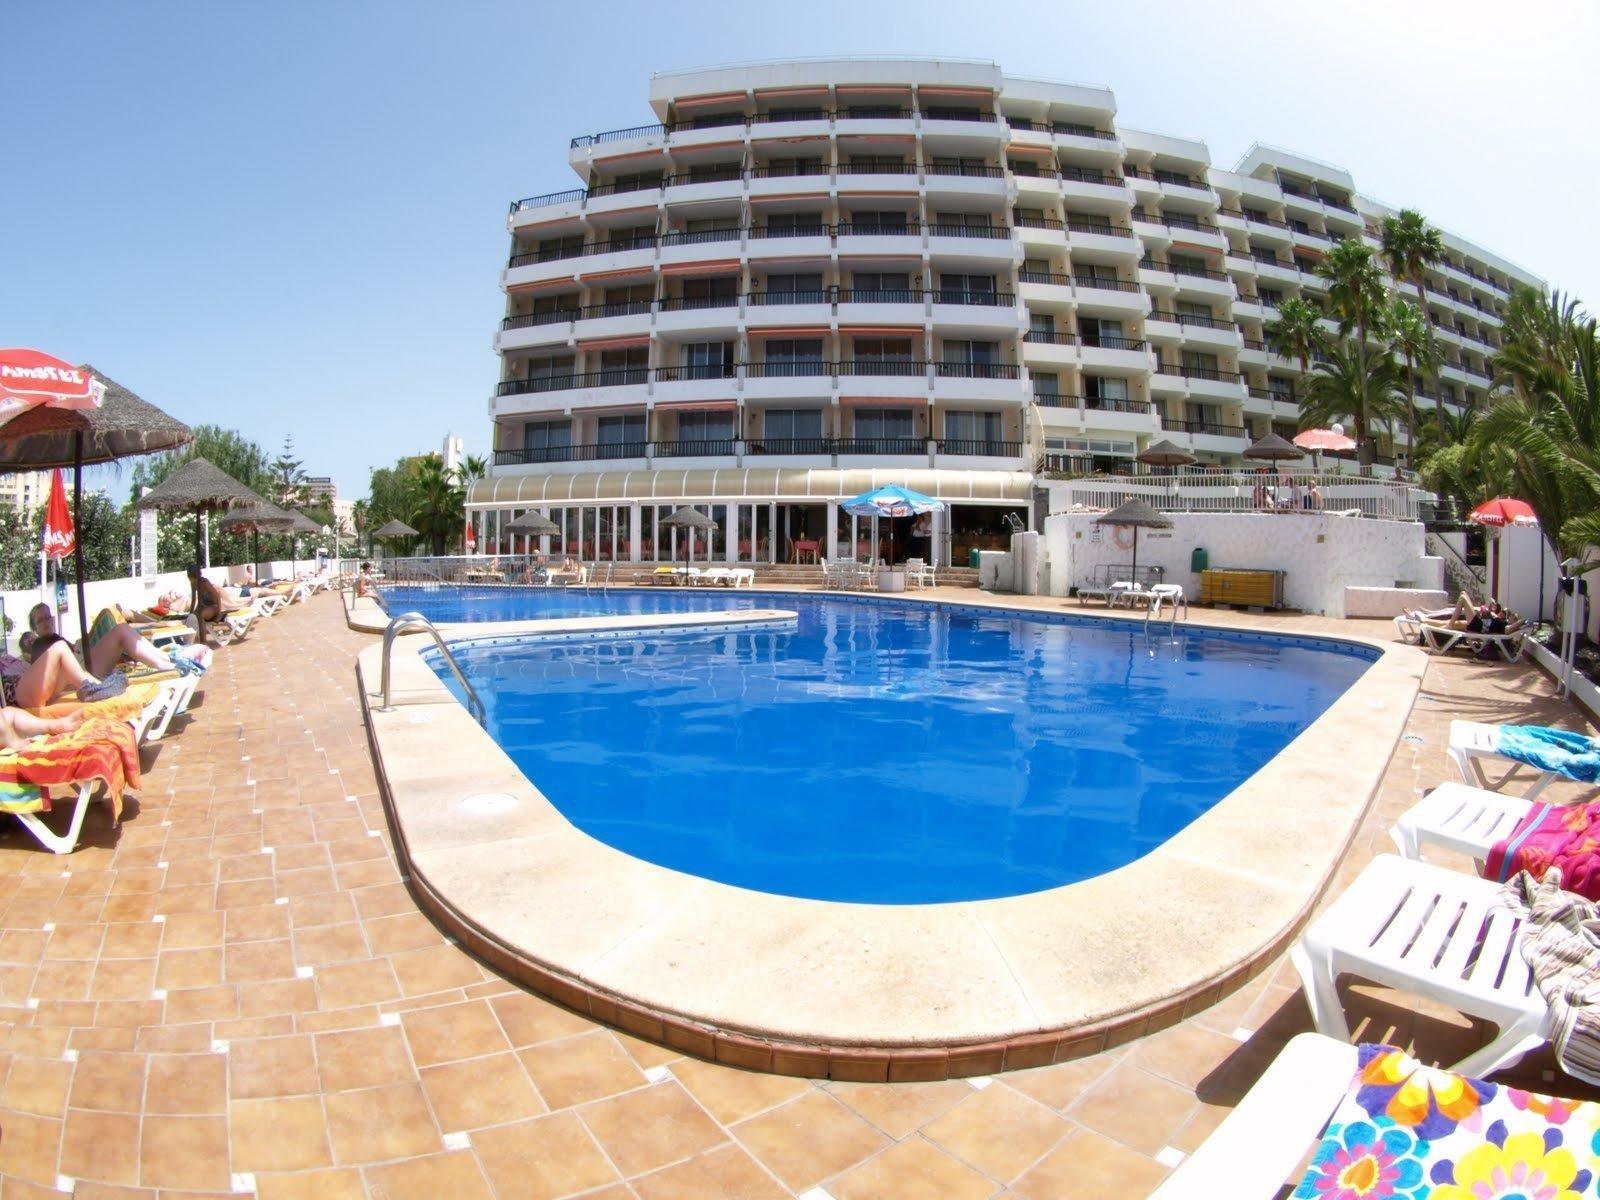 3 star hotel - Hotel Riu Caribe